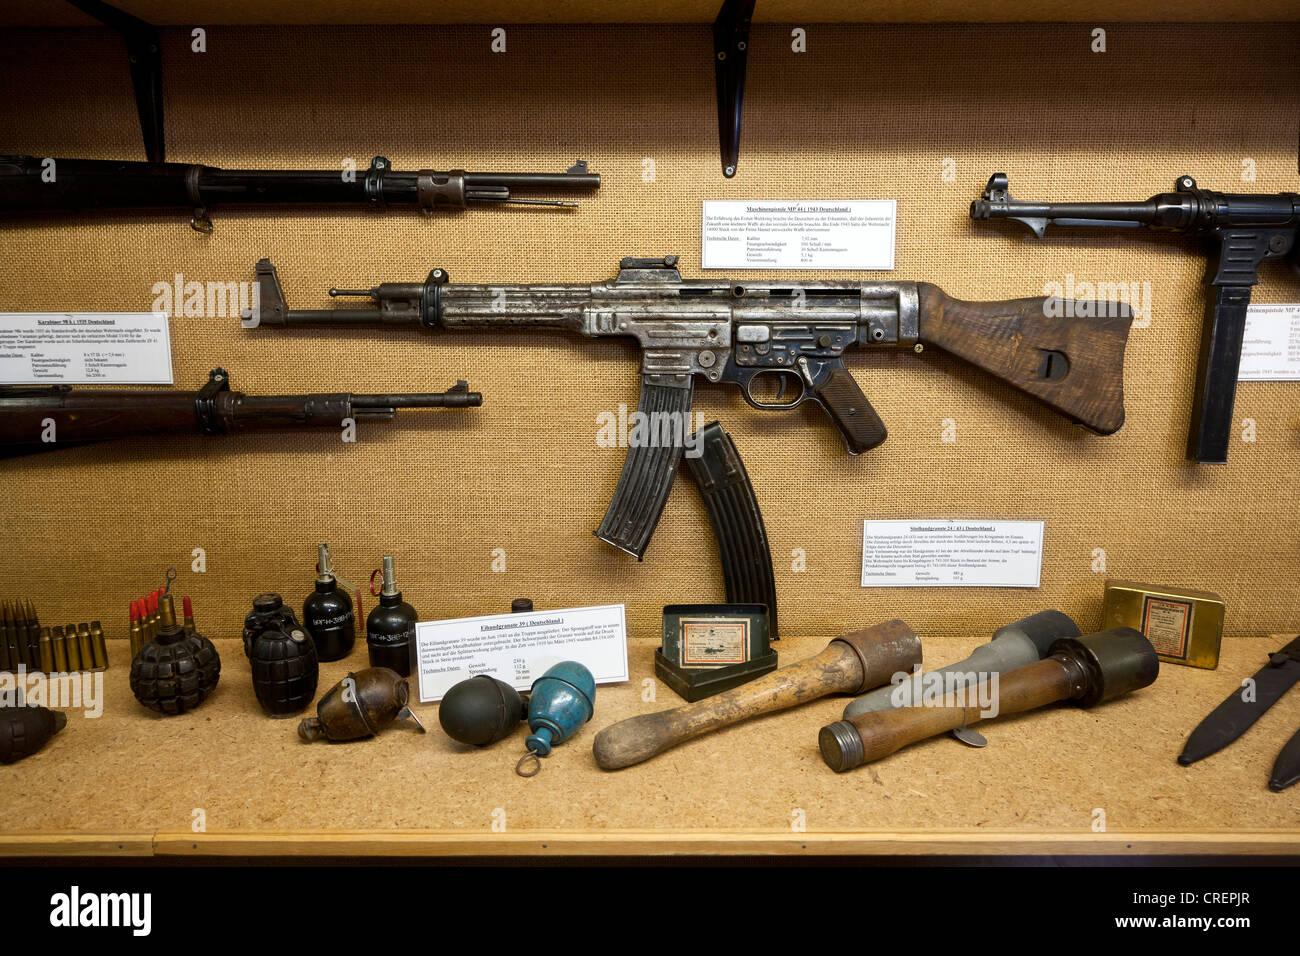 Firearms and hand grenades, Stammheim military museum, Stammheim, Landkreis Schweinfurt county, Lower Franconia, - Stock Image